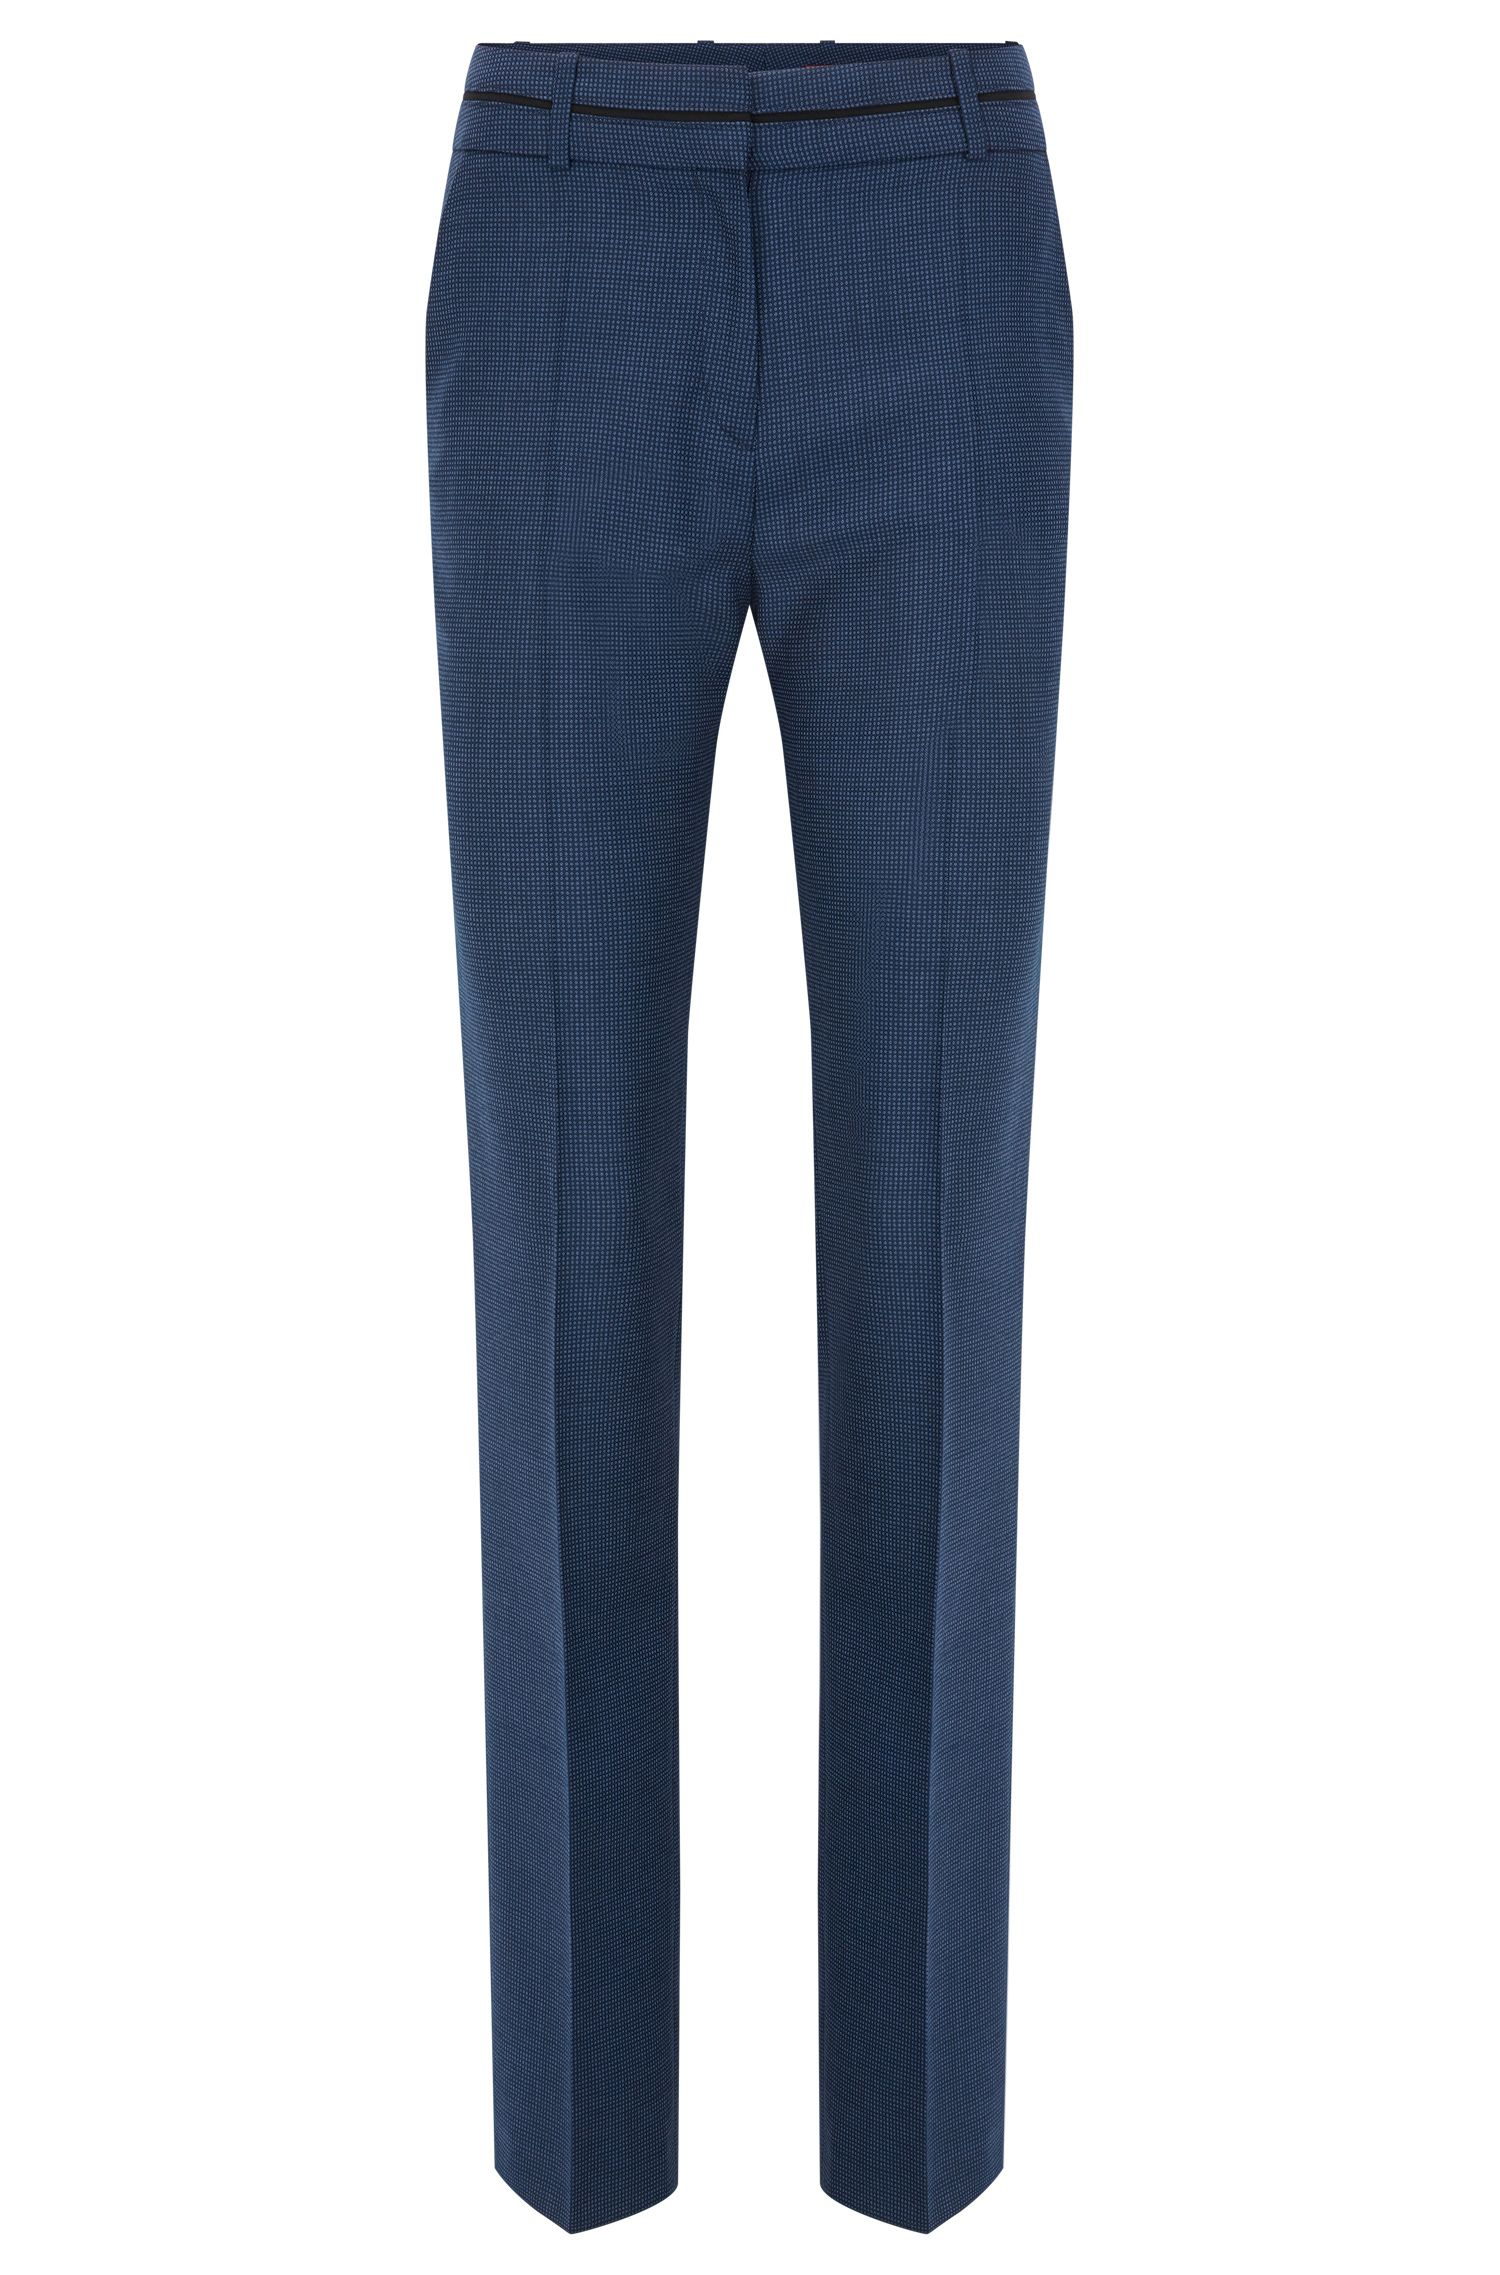 Regular-fit trousers in patterned virgin wool